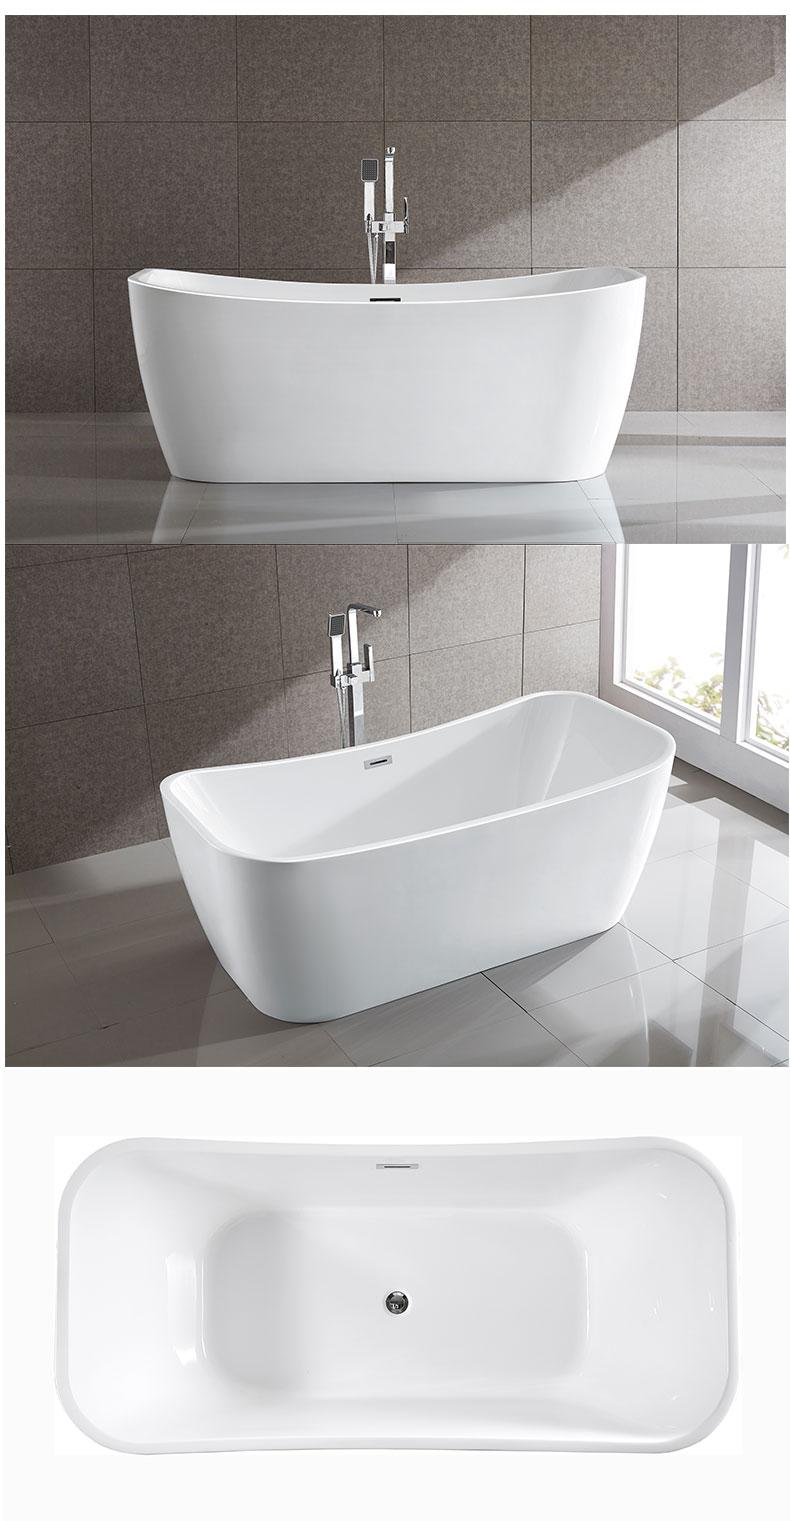 1700x800 Freestanding Bathtub